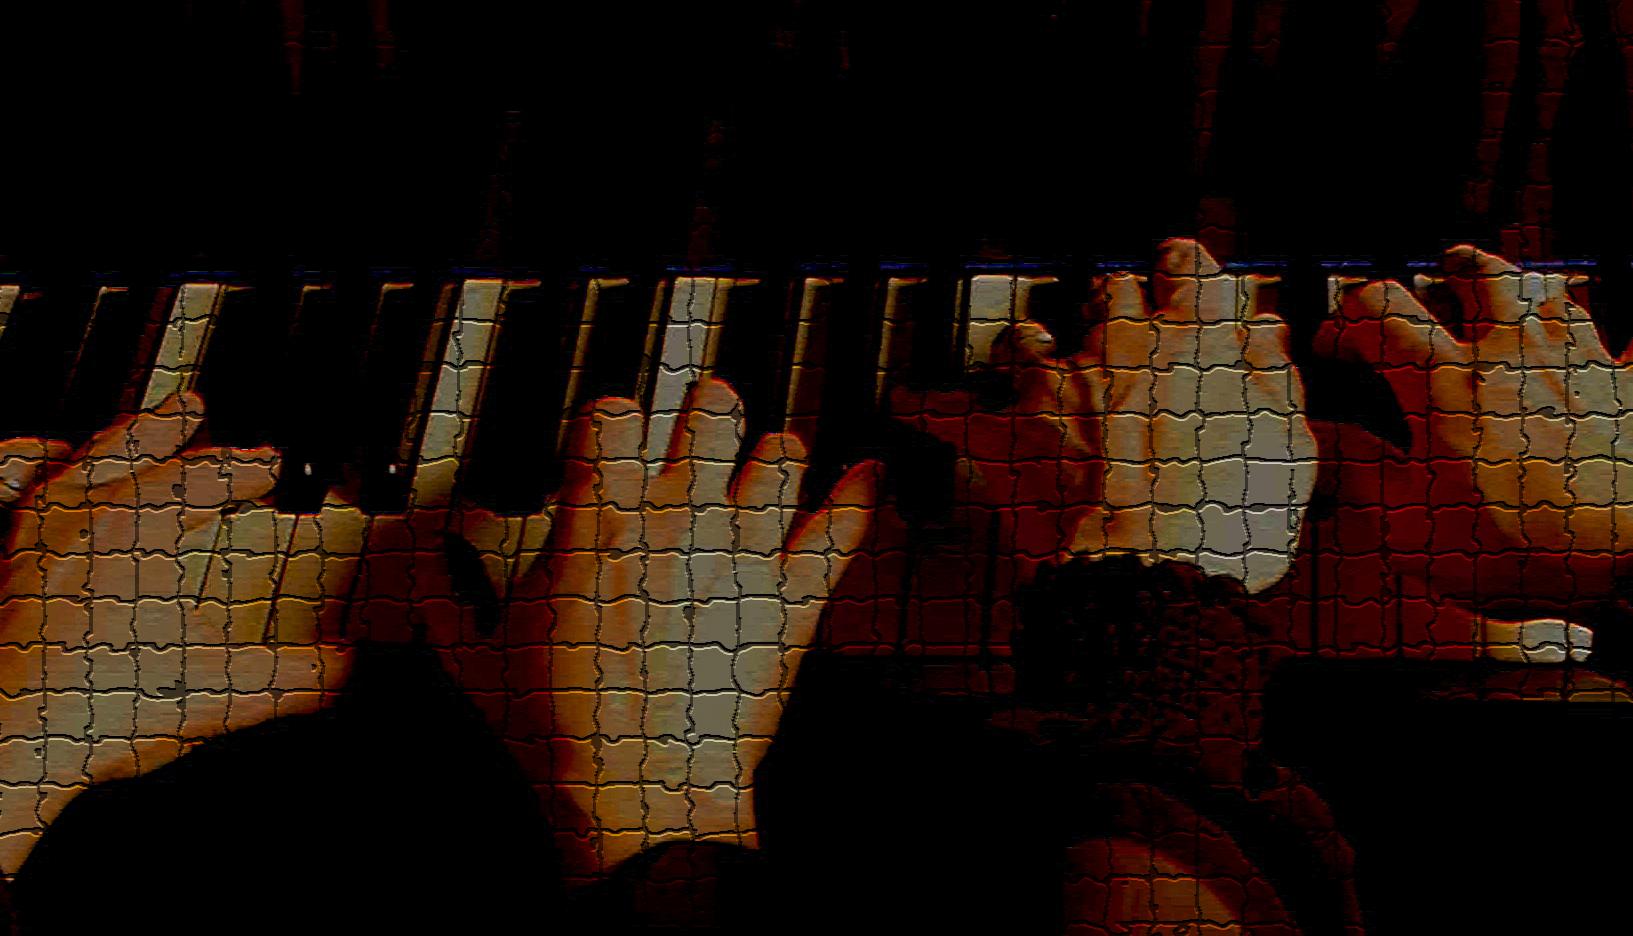 2 pianos